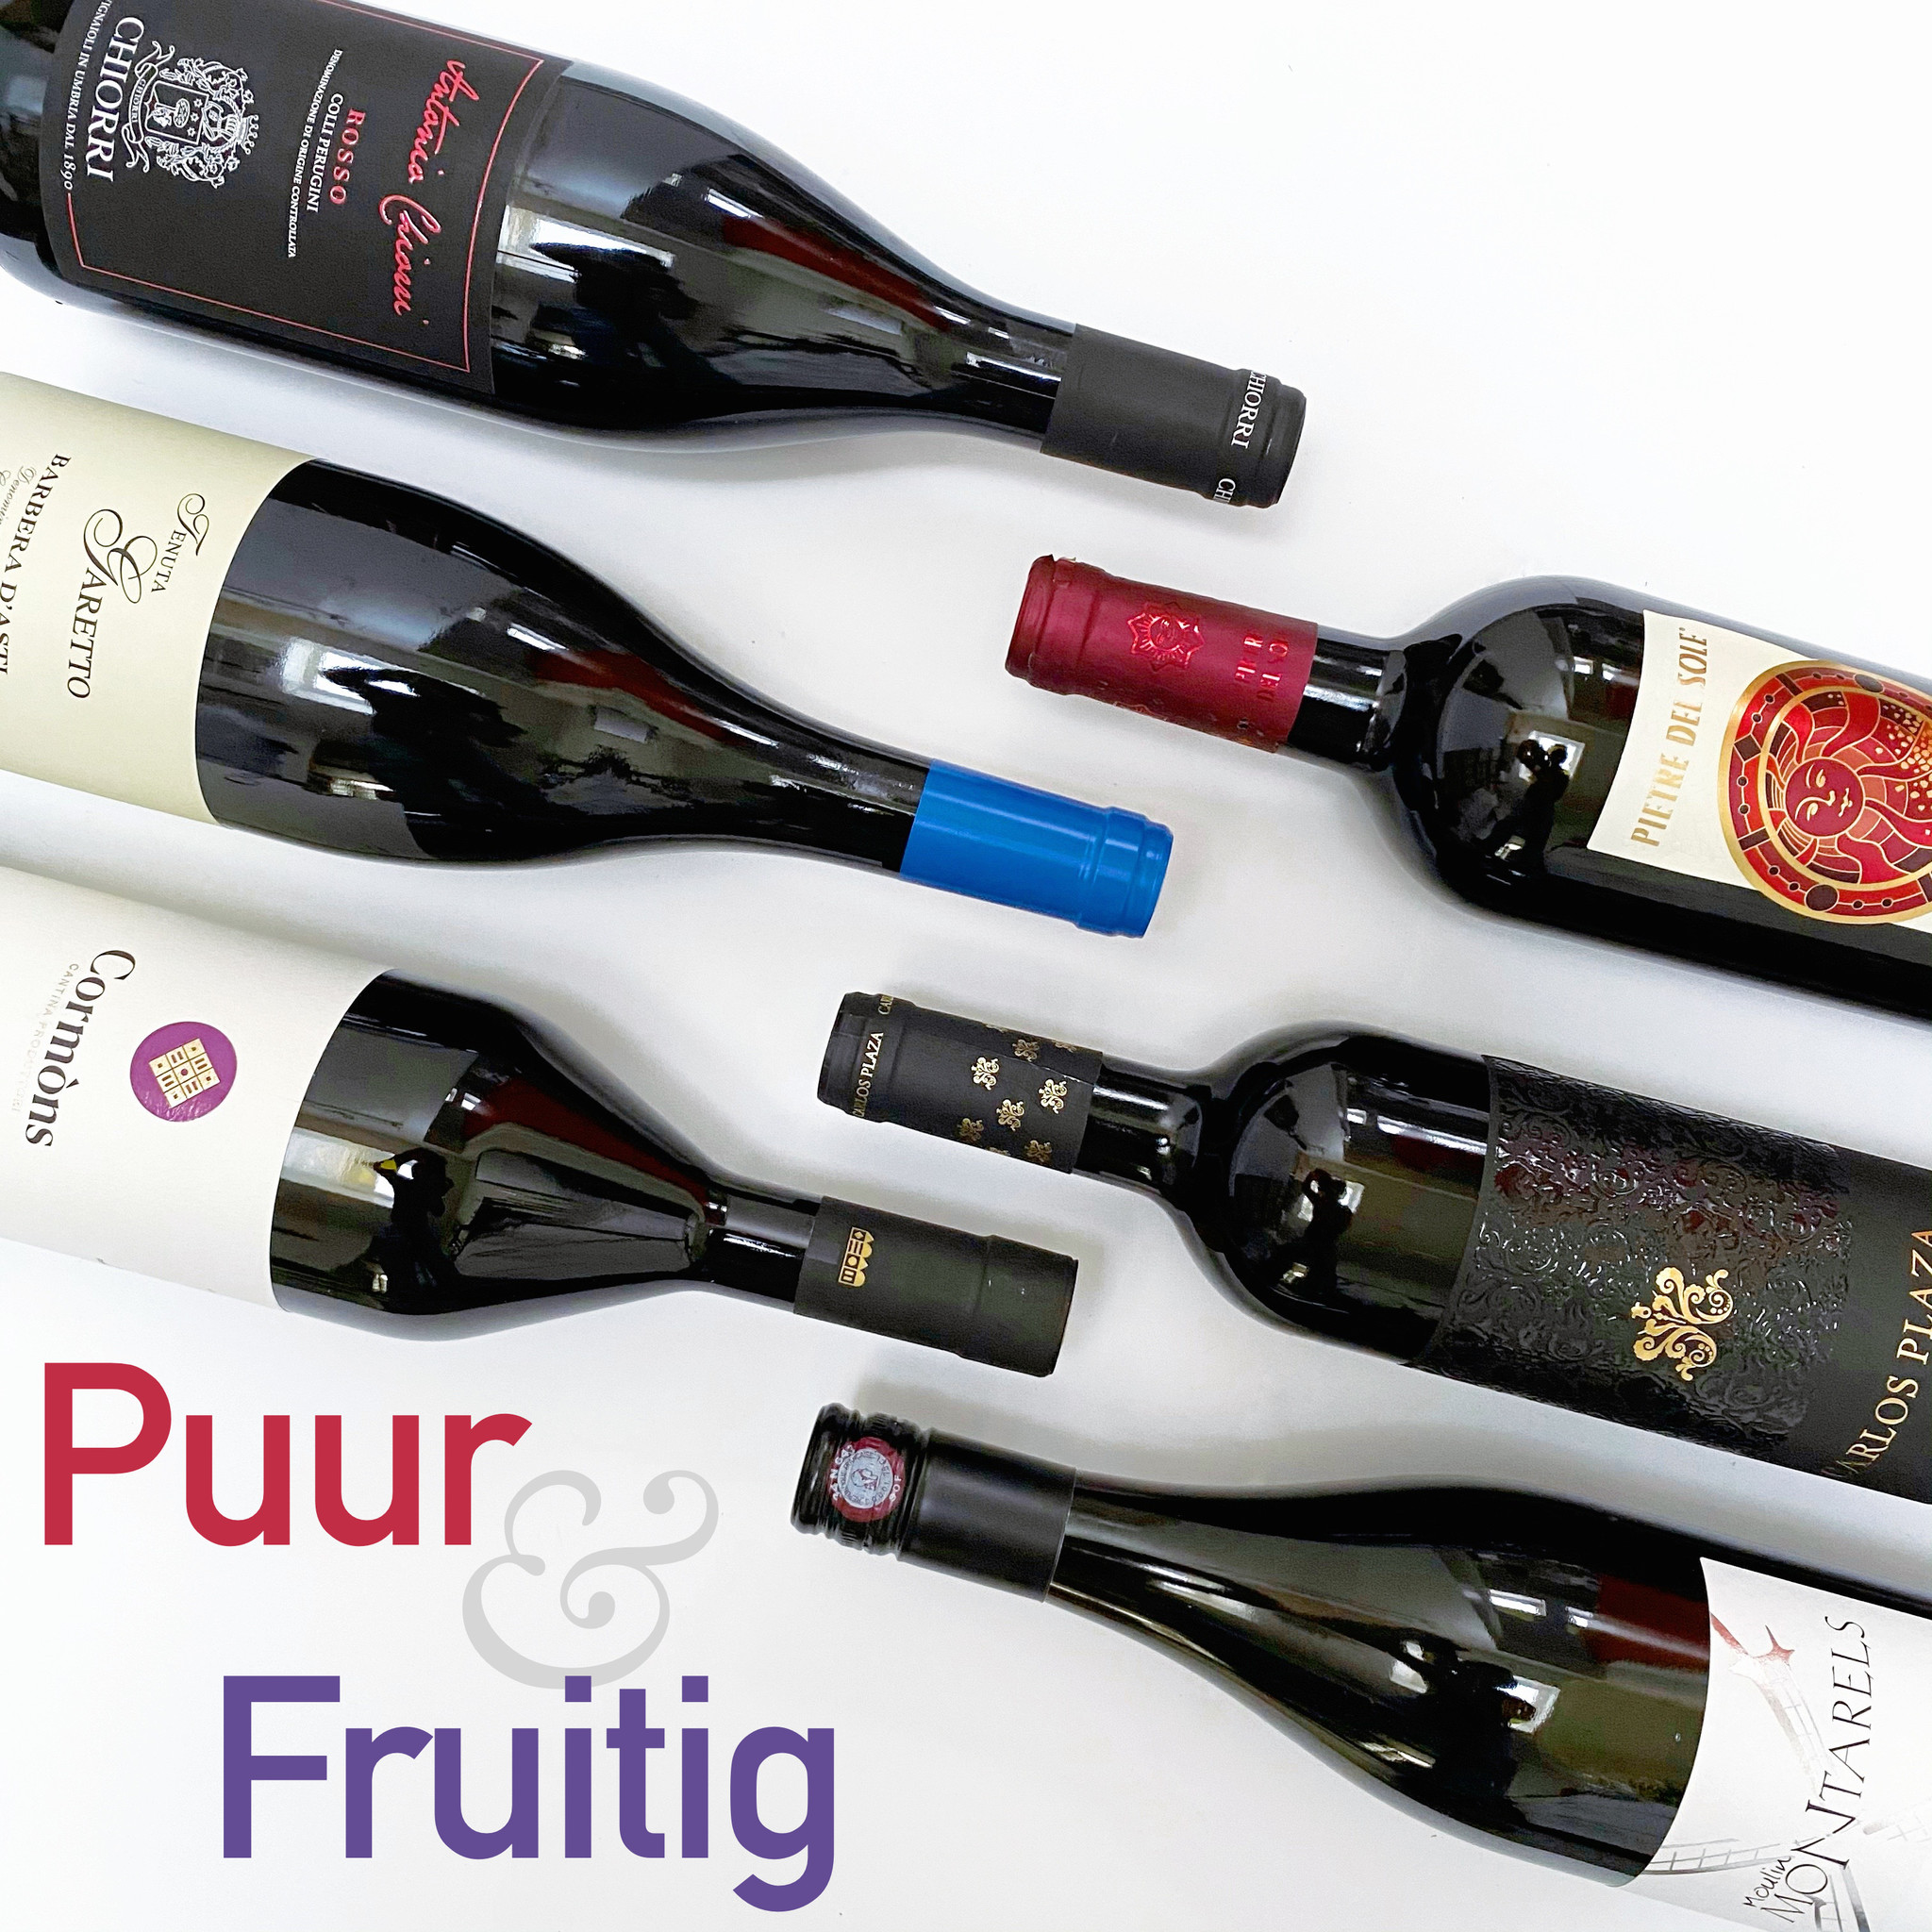 Puur & Fruitig Voordeelbox